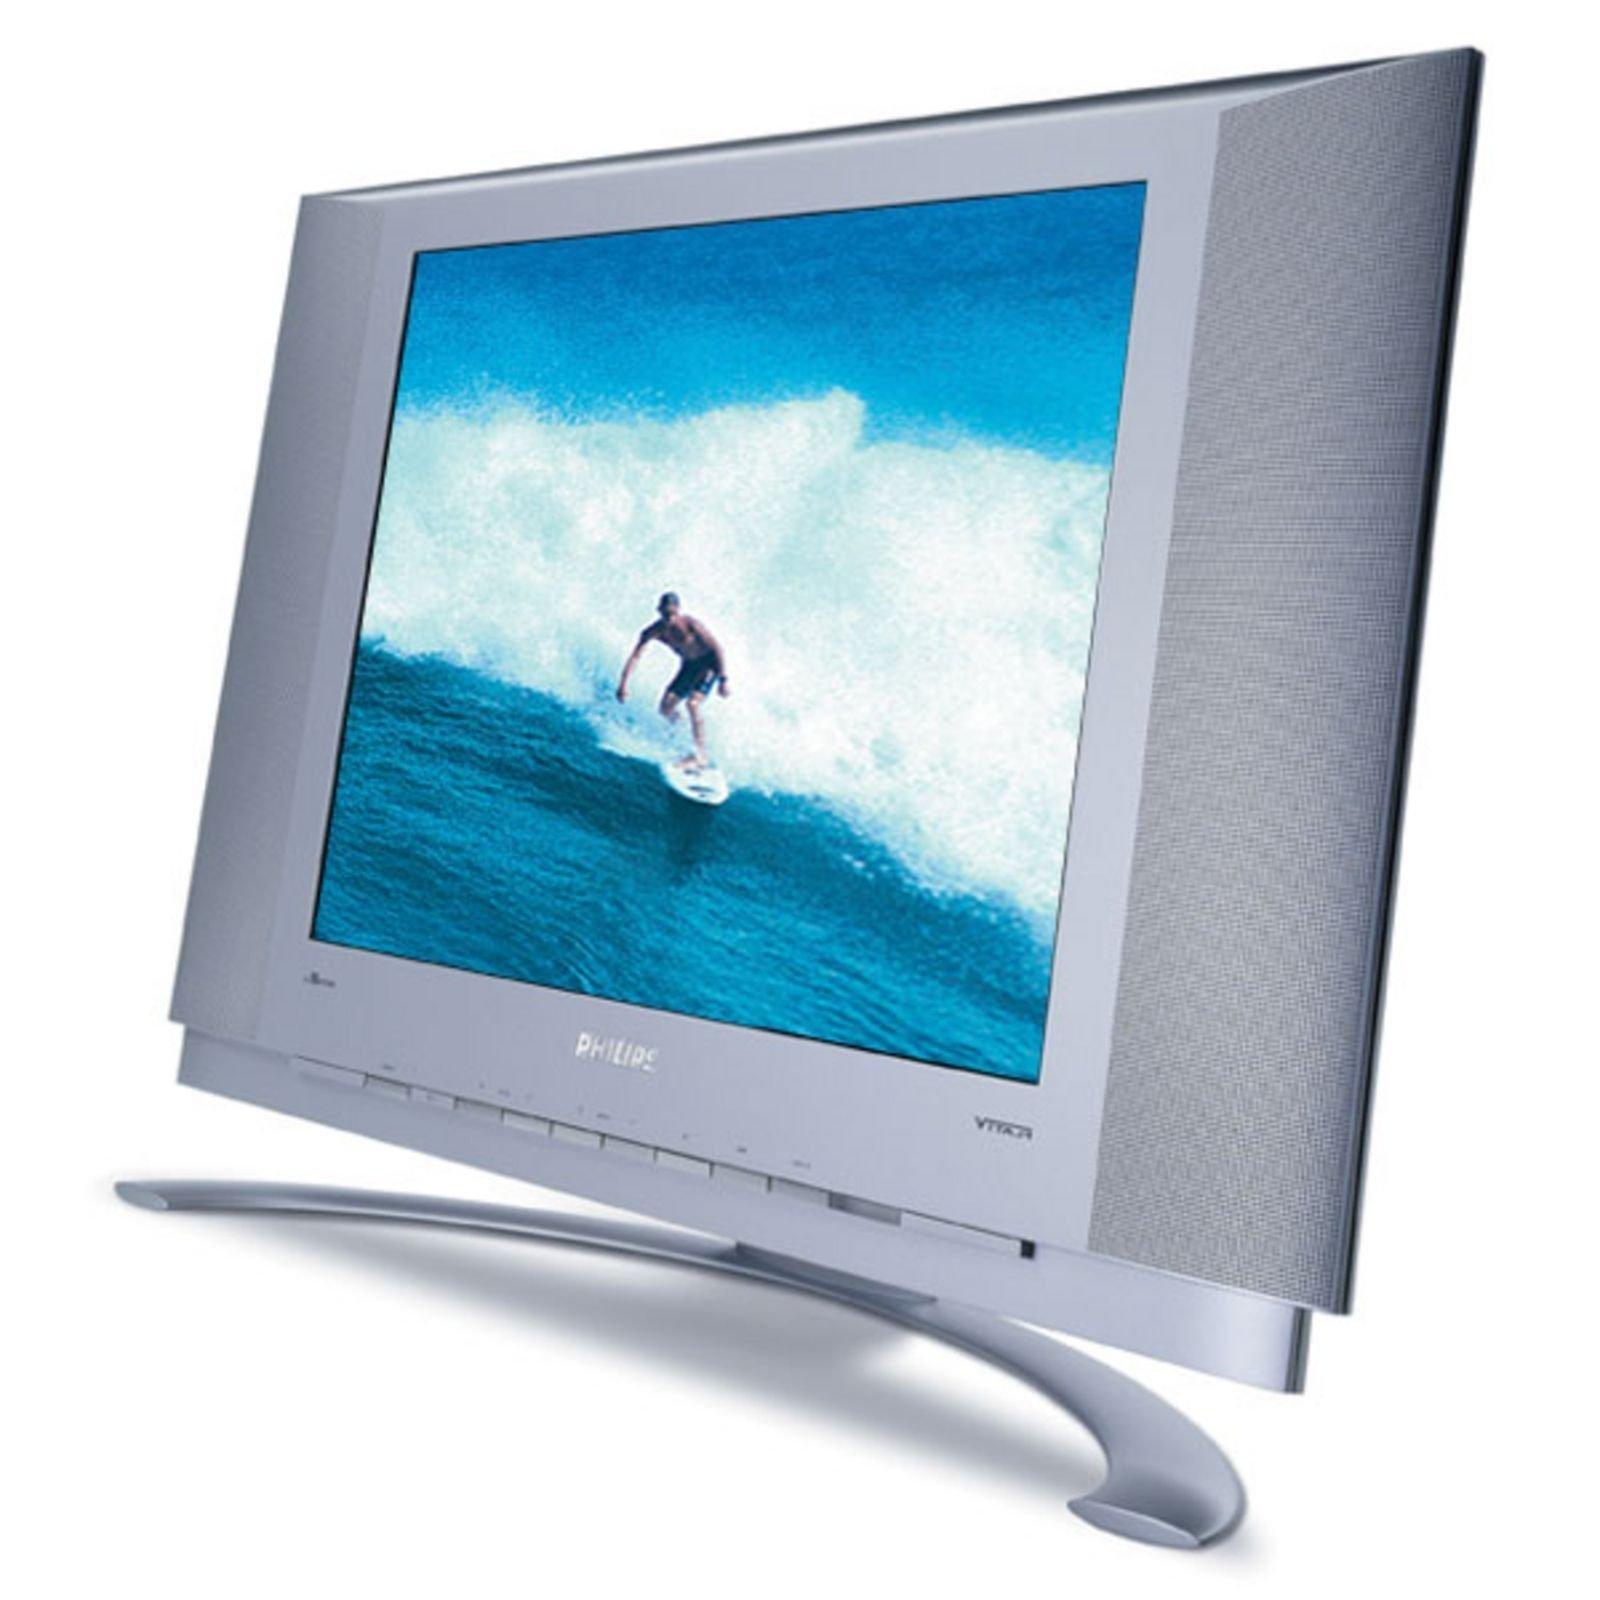 Philips 20PF9925/12S Televisor LCD 20